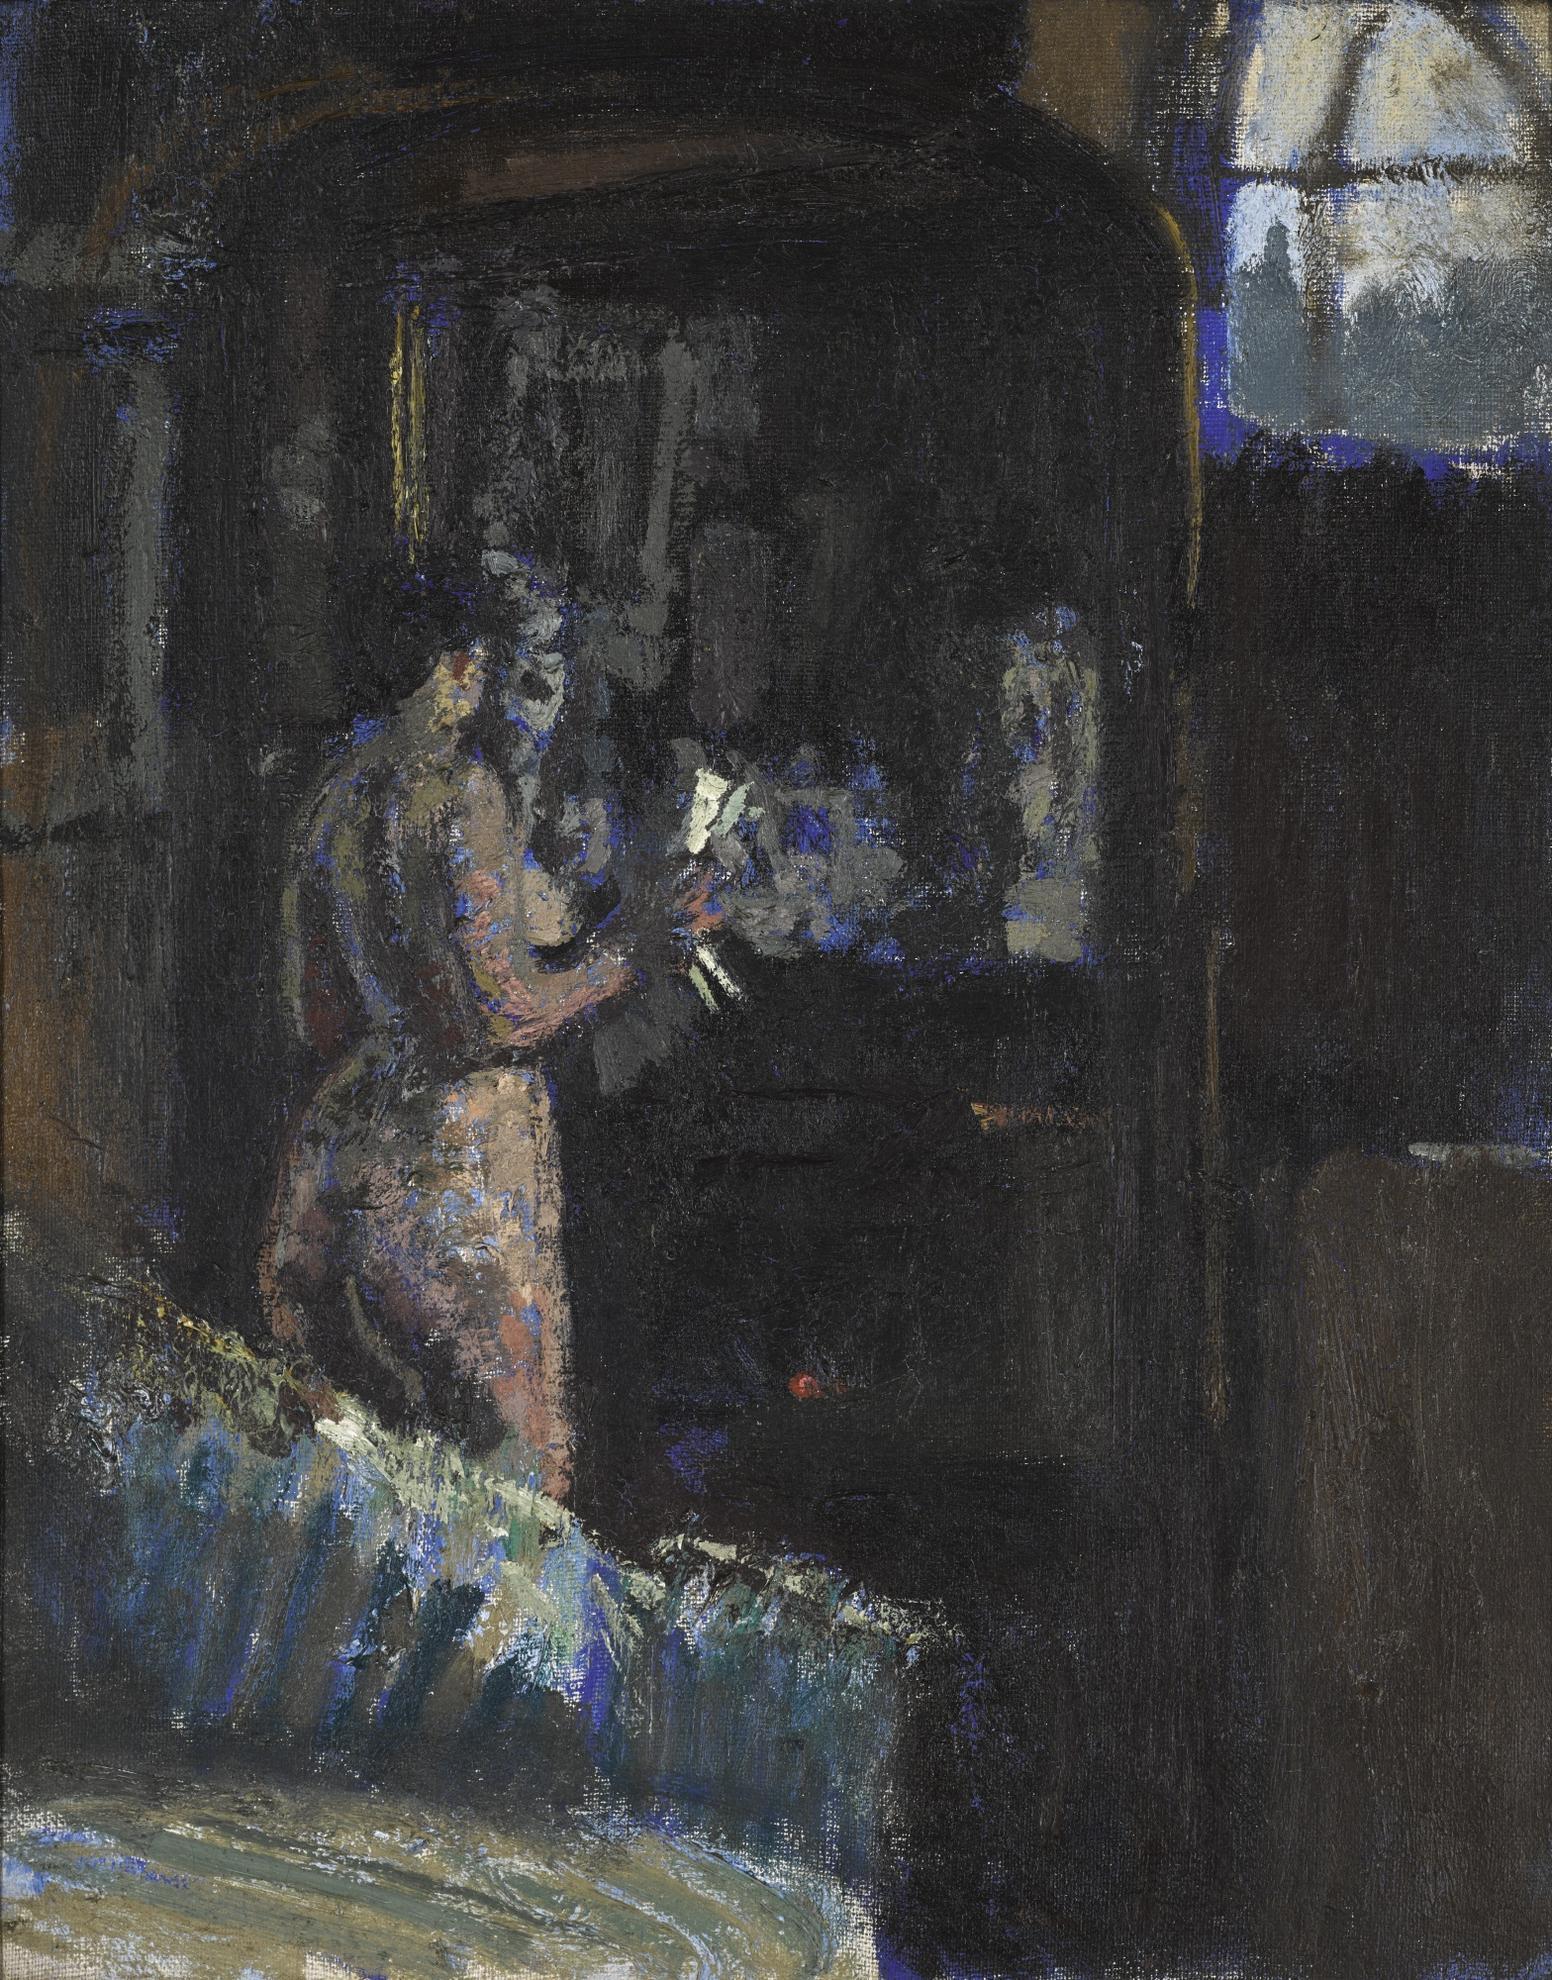 Walter Richard Sickert-Nude Before A Mirror, Fitzroy Street-1906